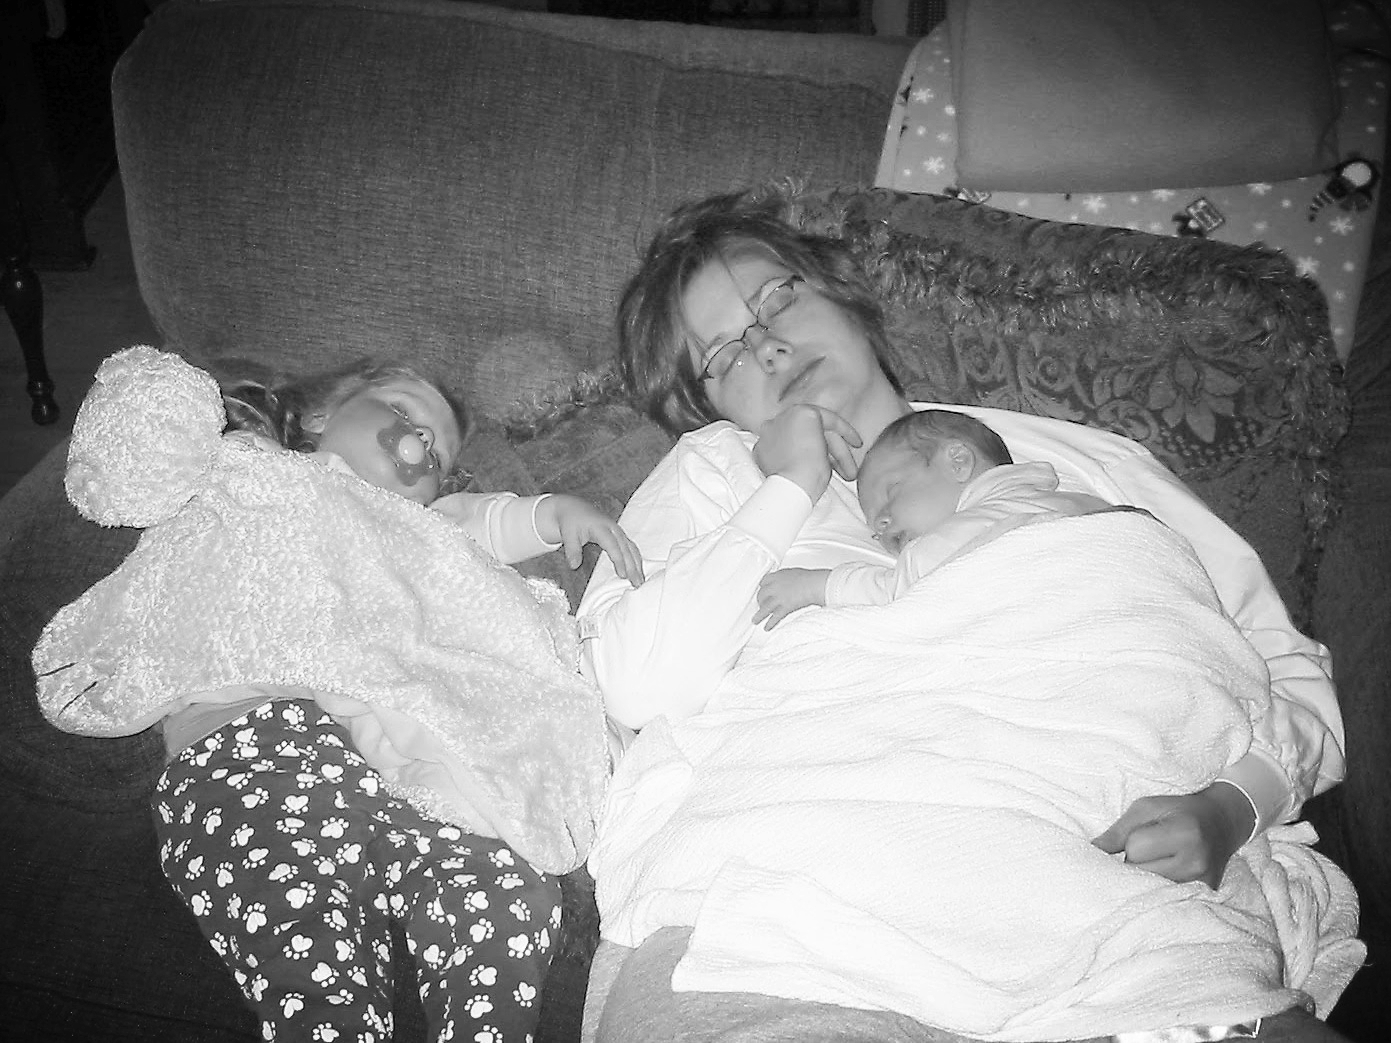 Asleep with My babies.jpg